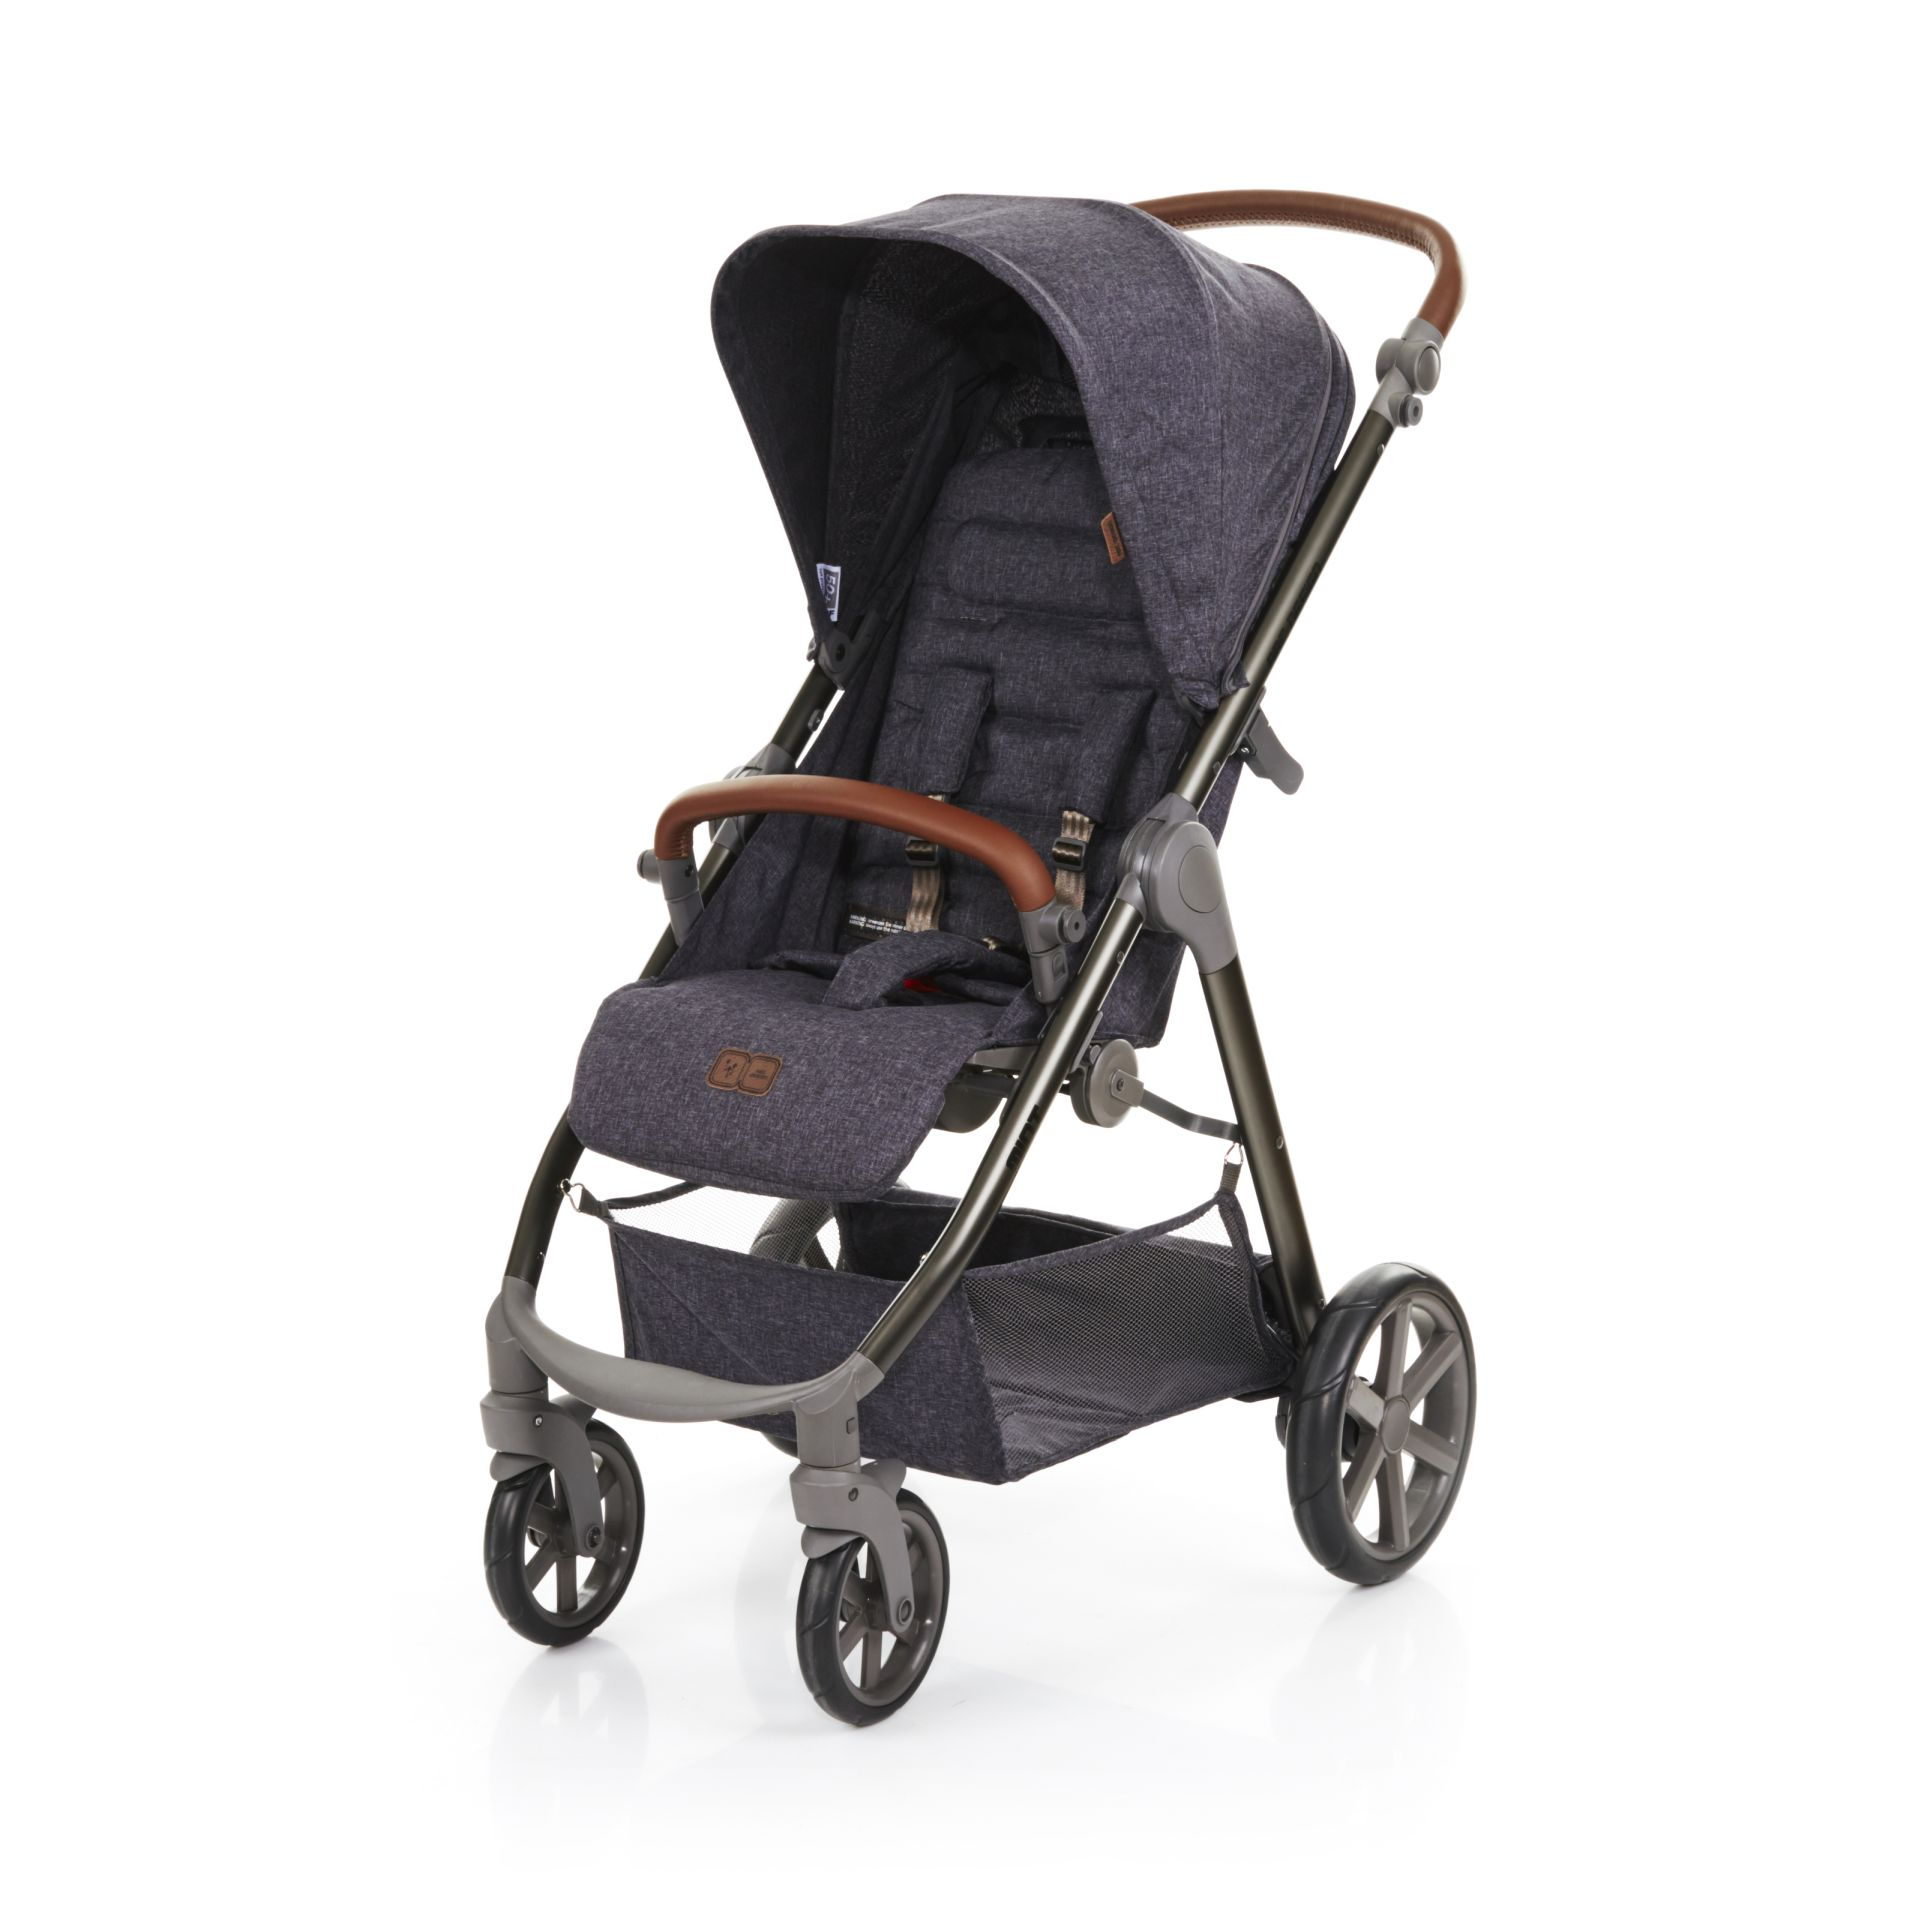 abc design buggy mint 2018 street online kaufen bei kidsroom kinderwagen. Black Bedroom Furniture Sets. Home Design Ideas